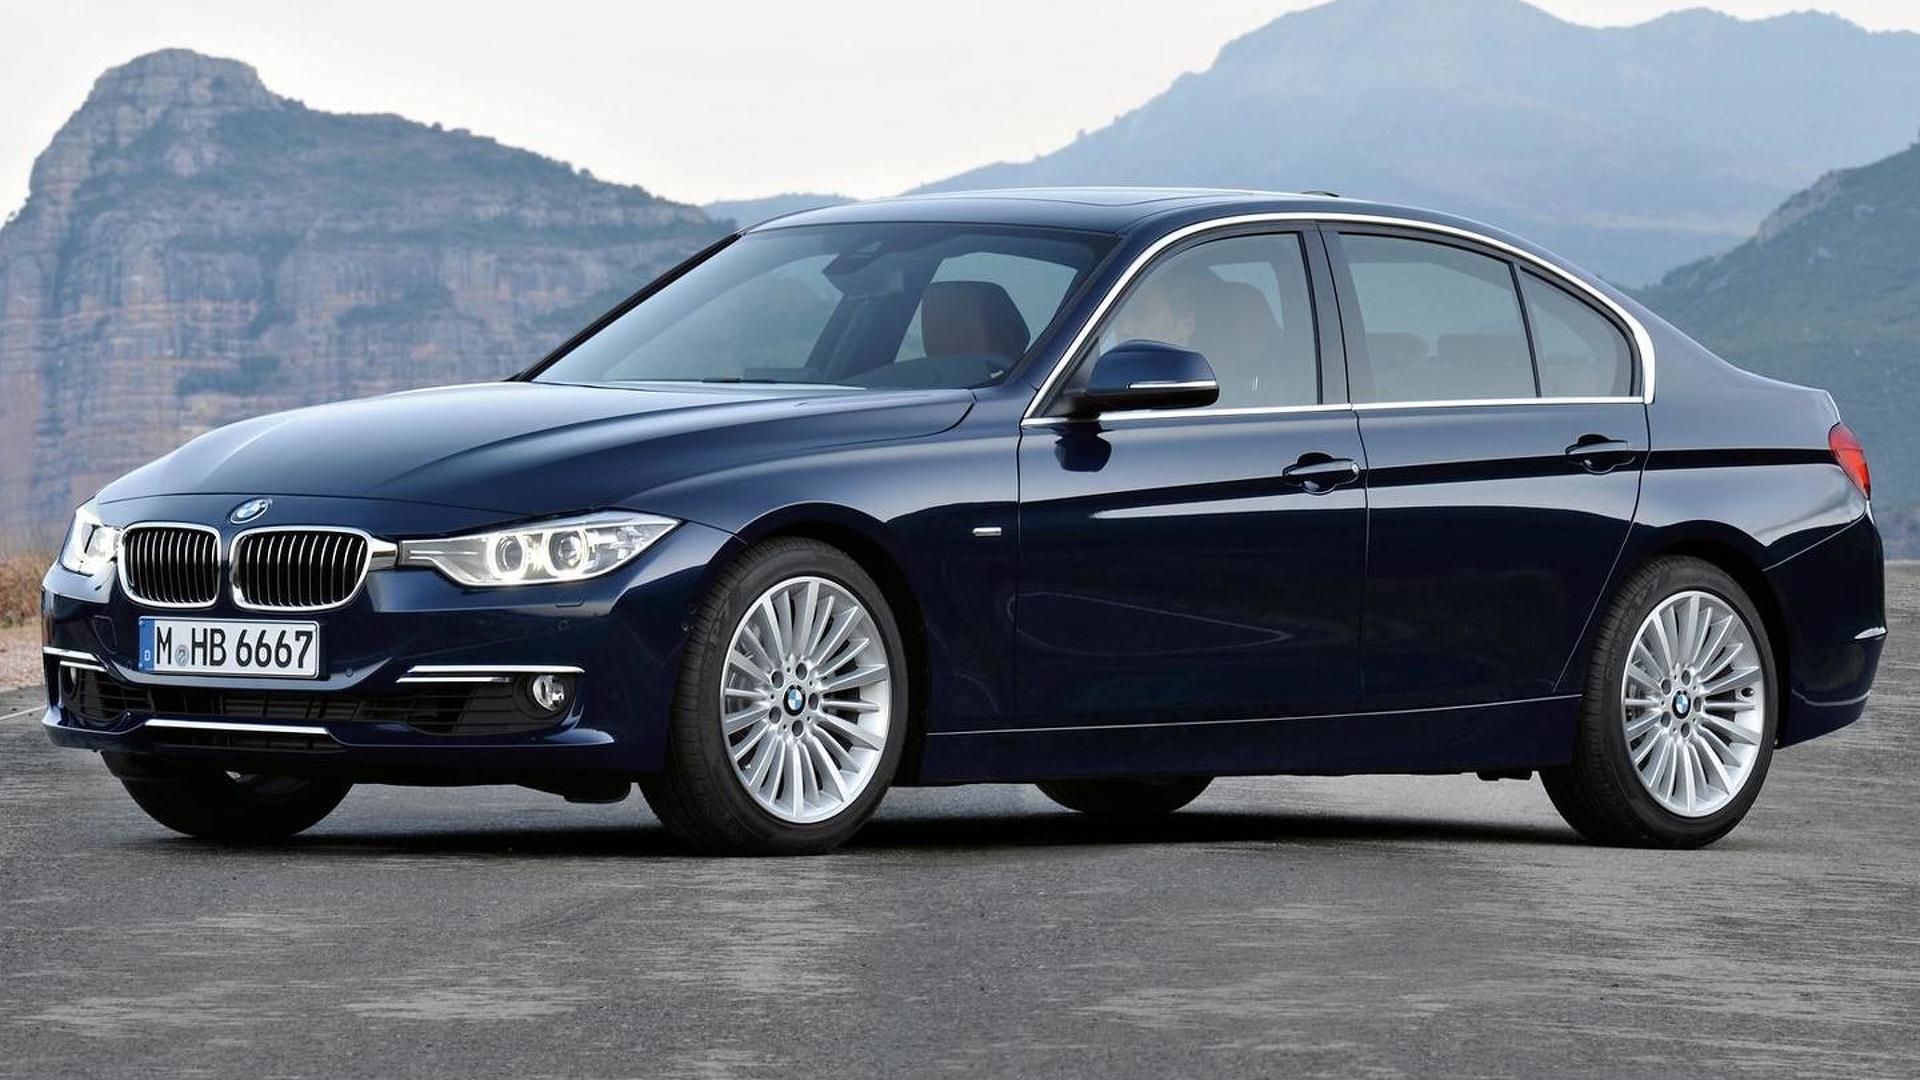 BMW 320i EfficientDynamics 316i & 3 series xDrive announced